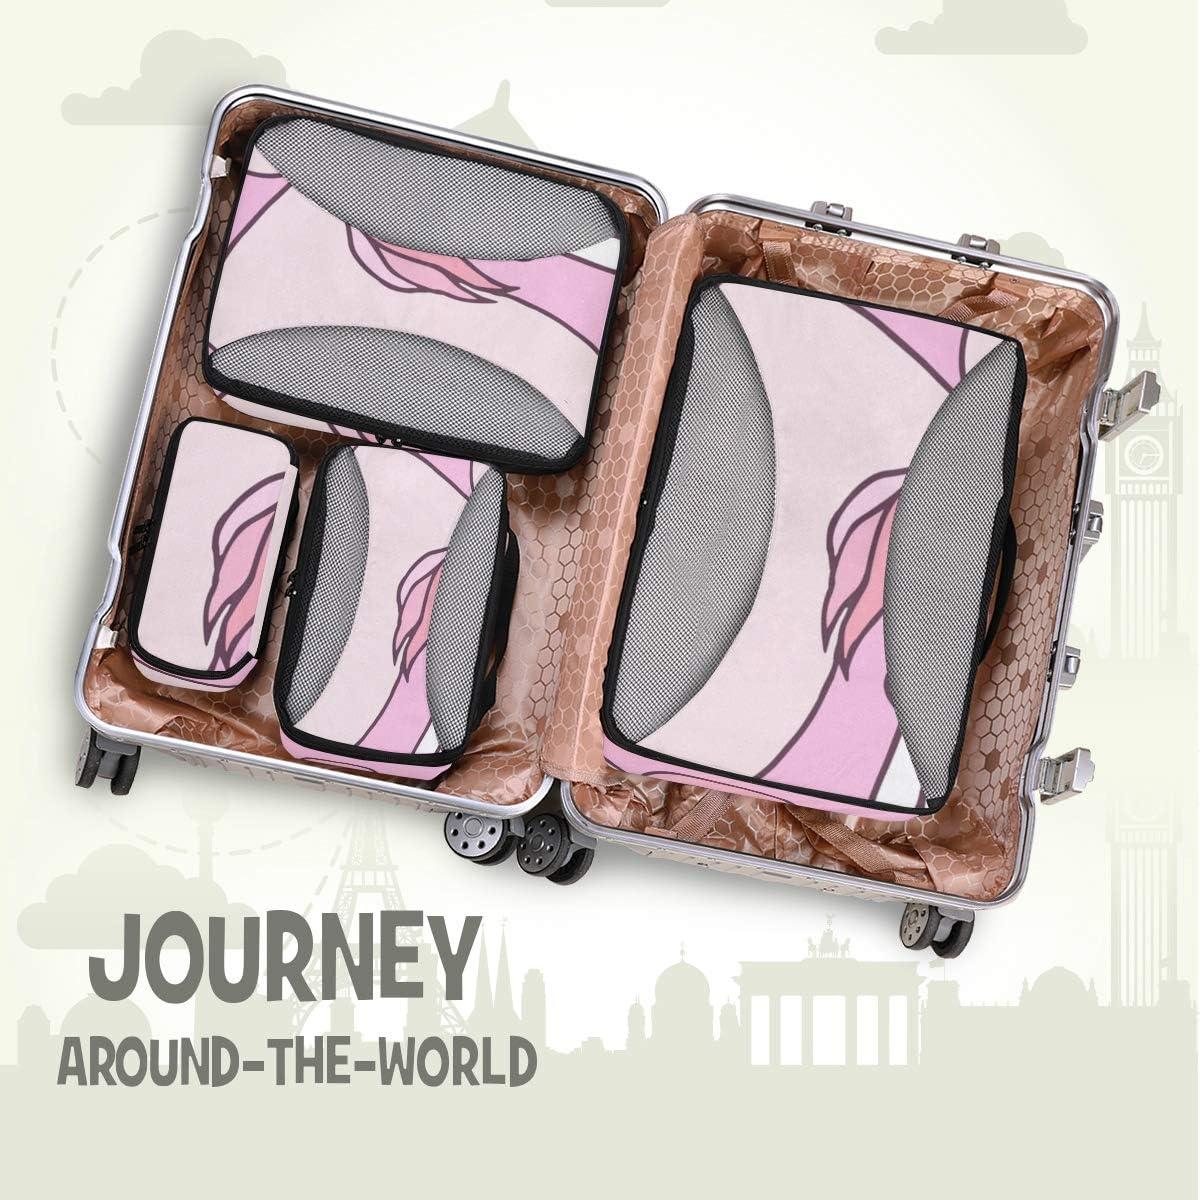 4 Set Packing Cubes Travel Luggage Packing Organizers Pink Unicorn